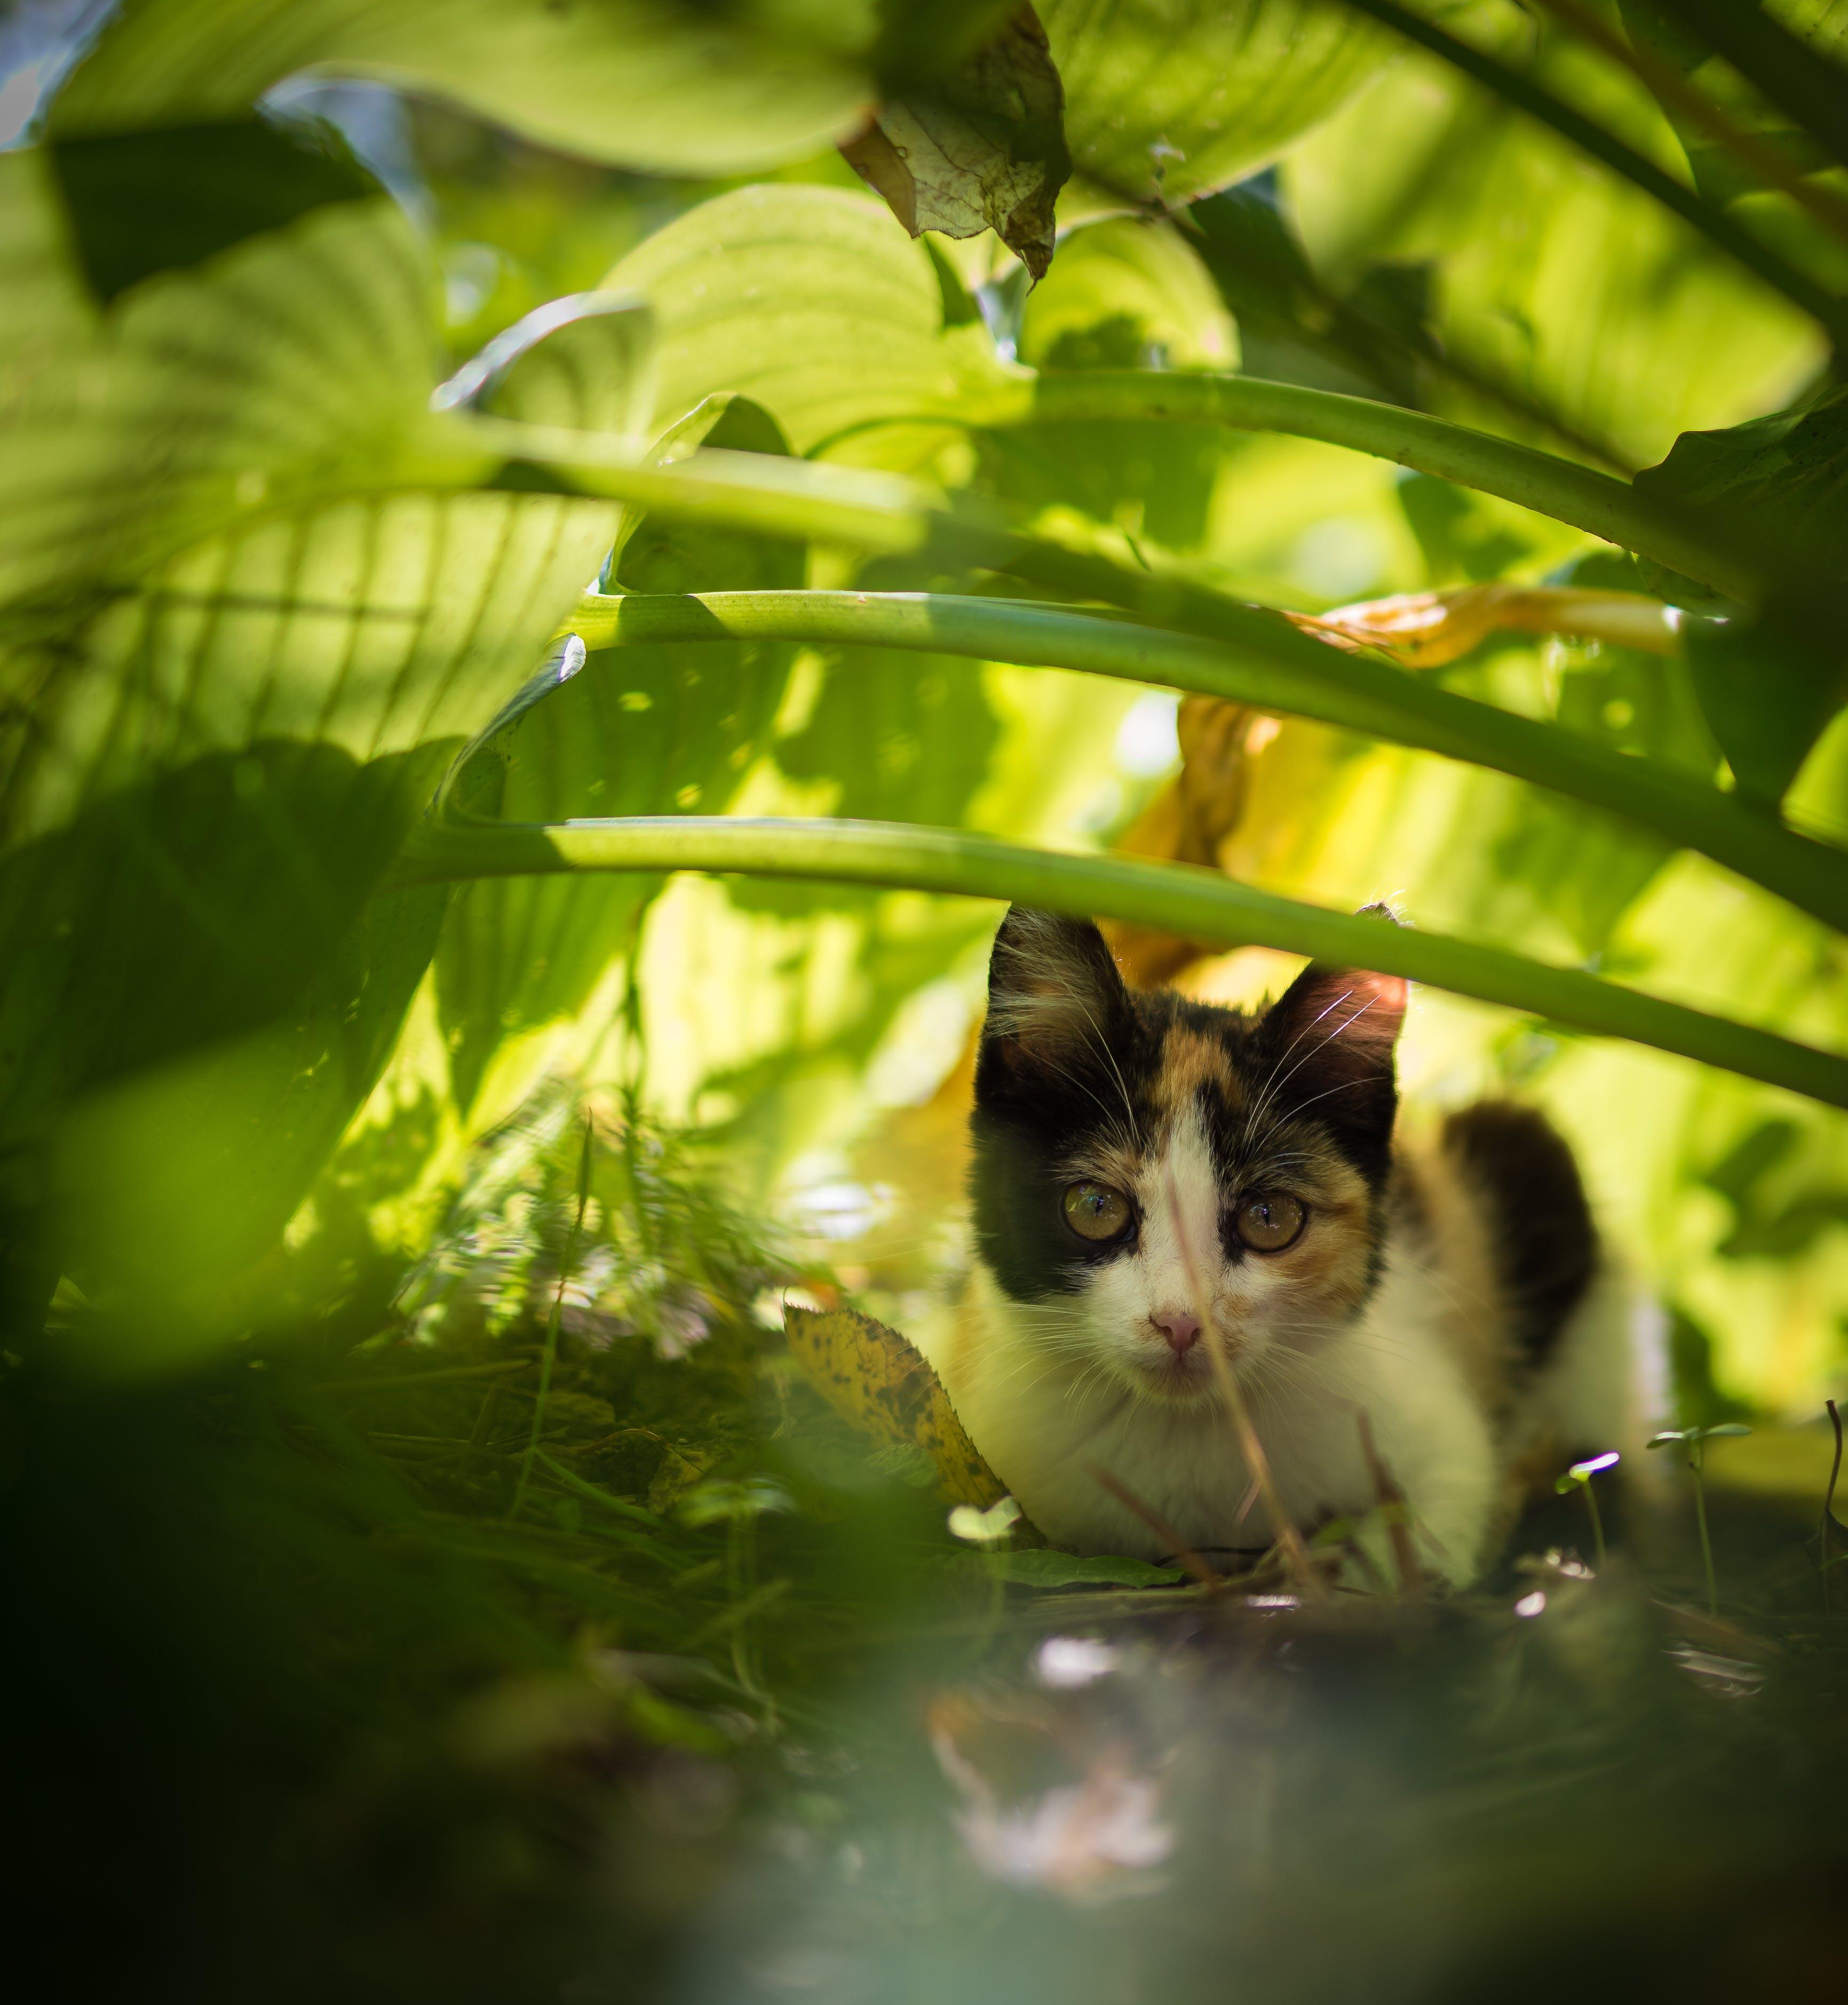 Free stock photo of cat, cats, feline, green